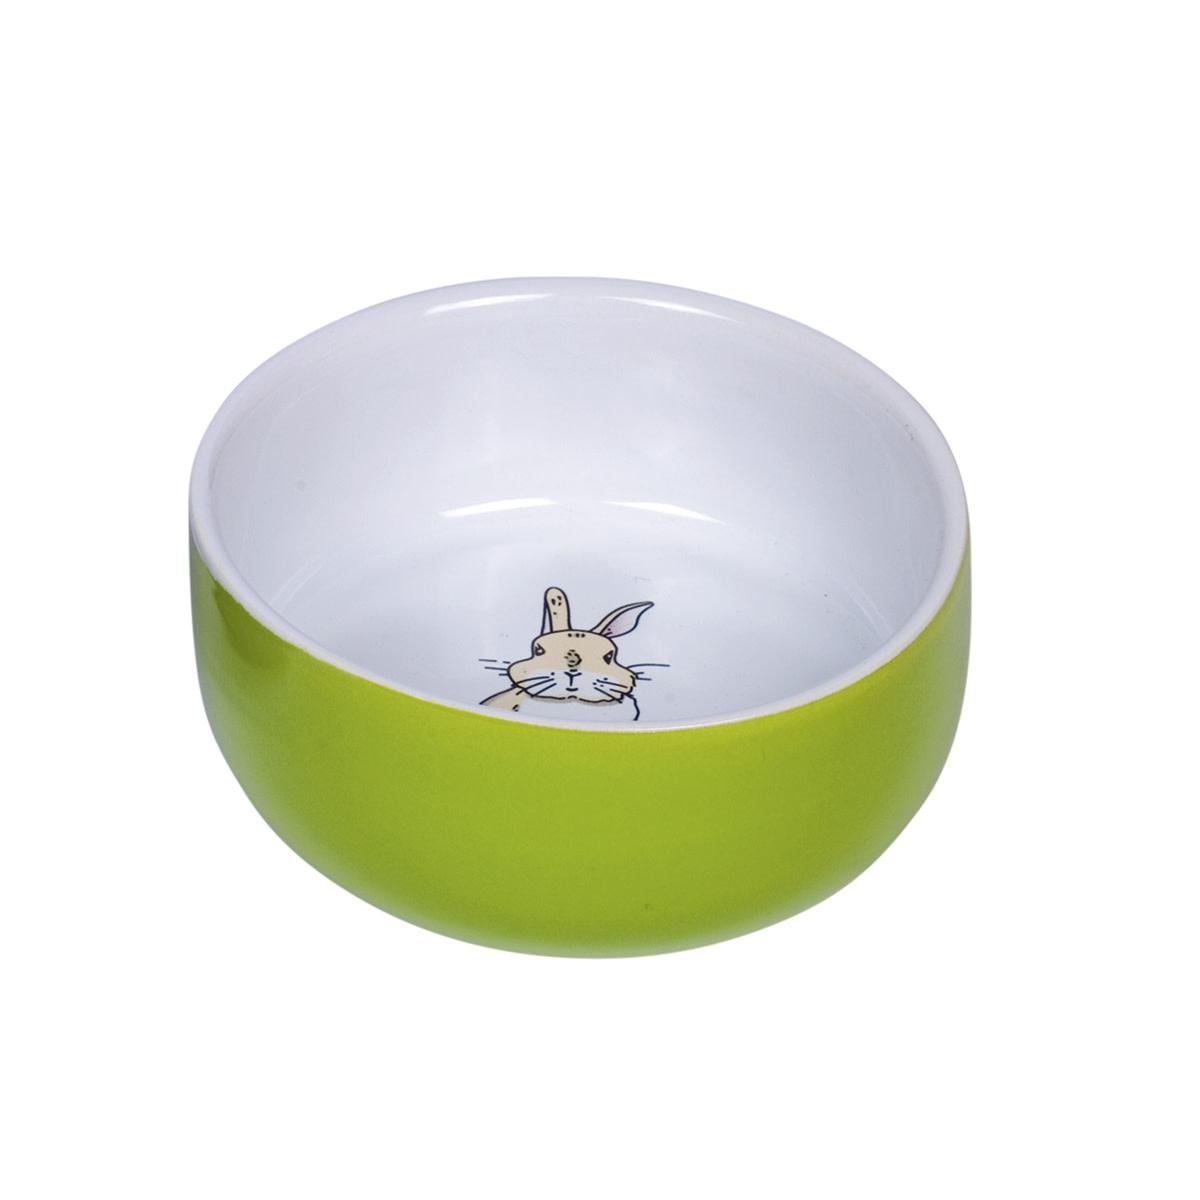 Eetbak knaag konijn groen